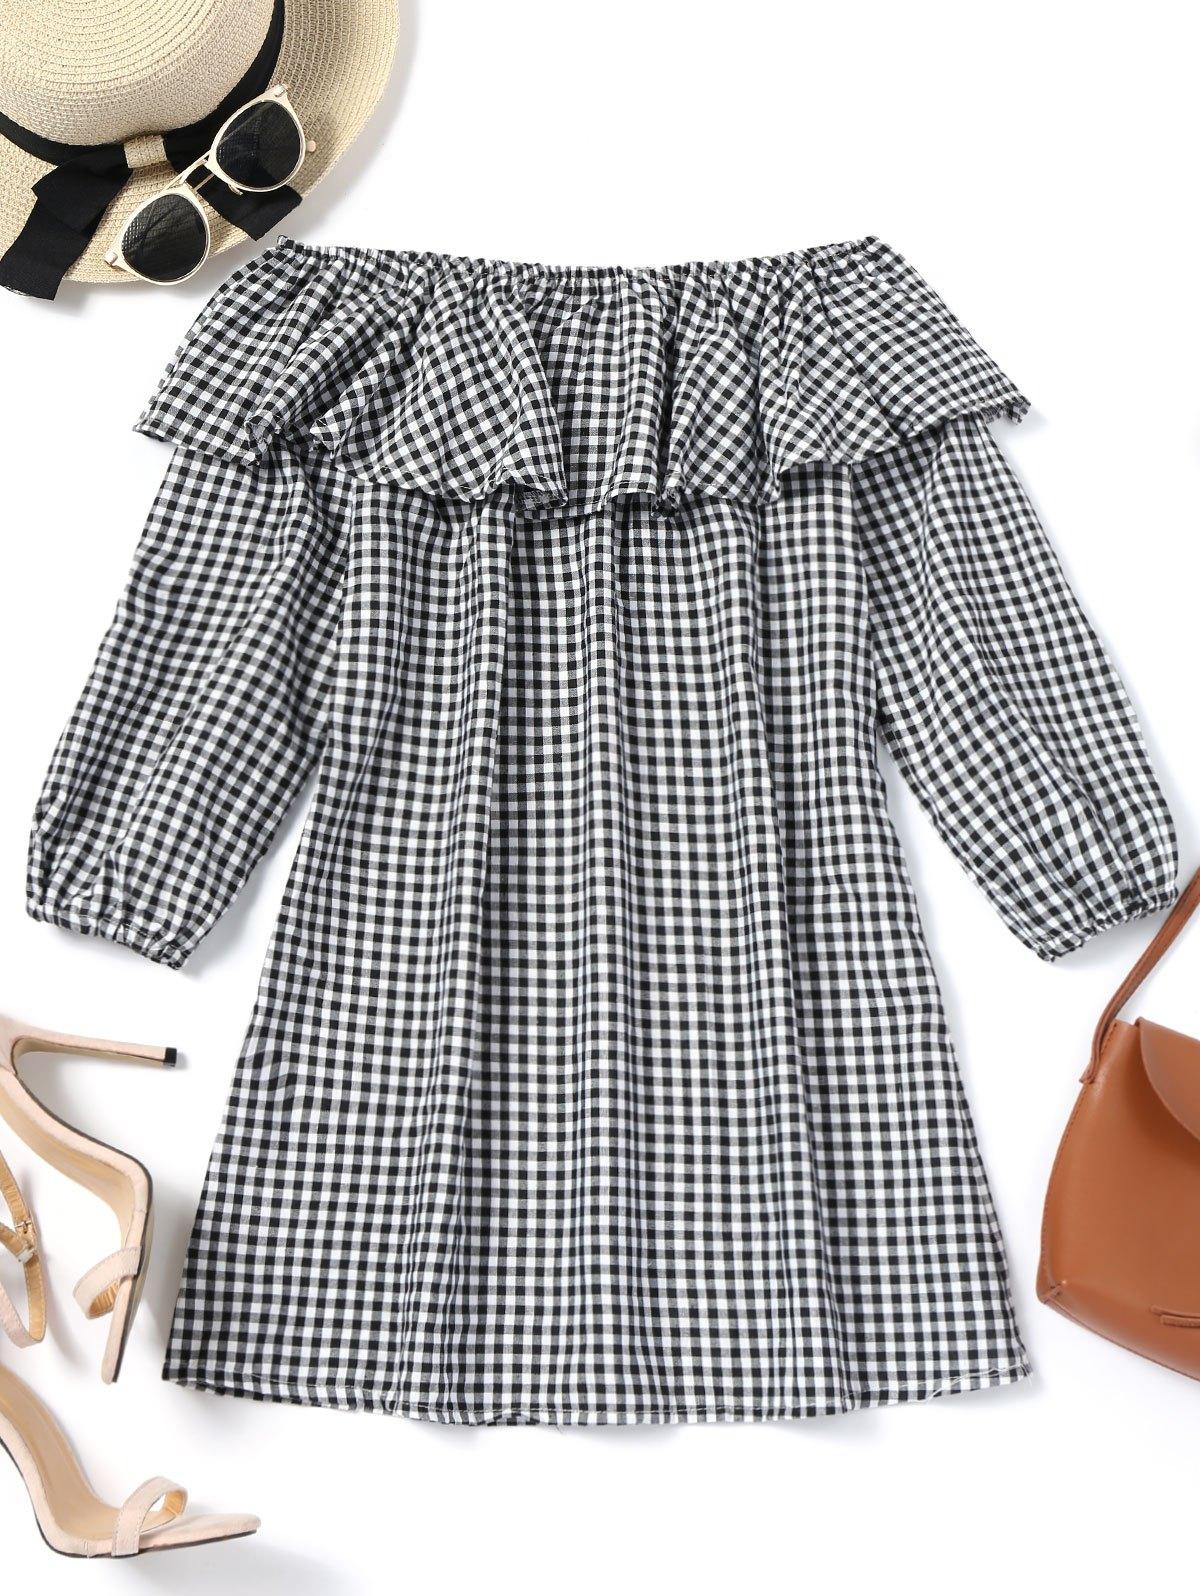 Plaid Ruffles Off Shoulder Mini Dress 241155604